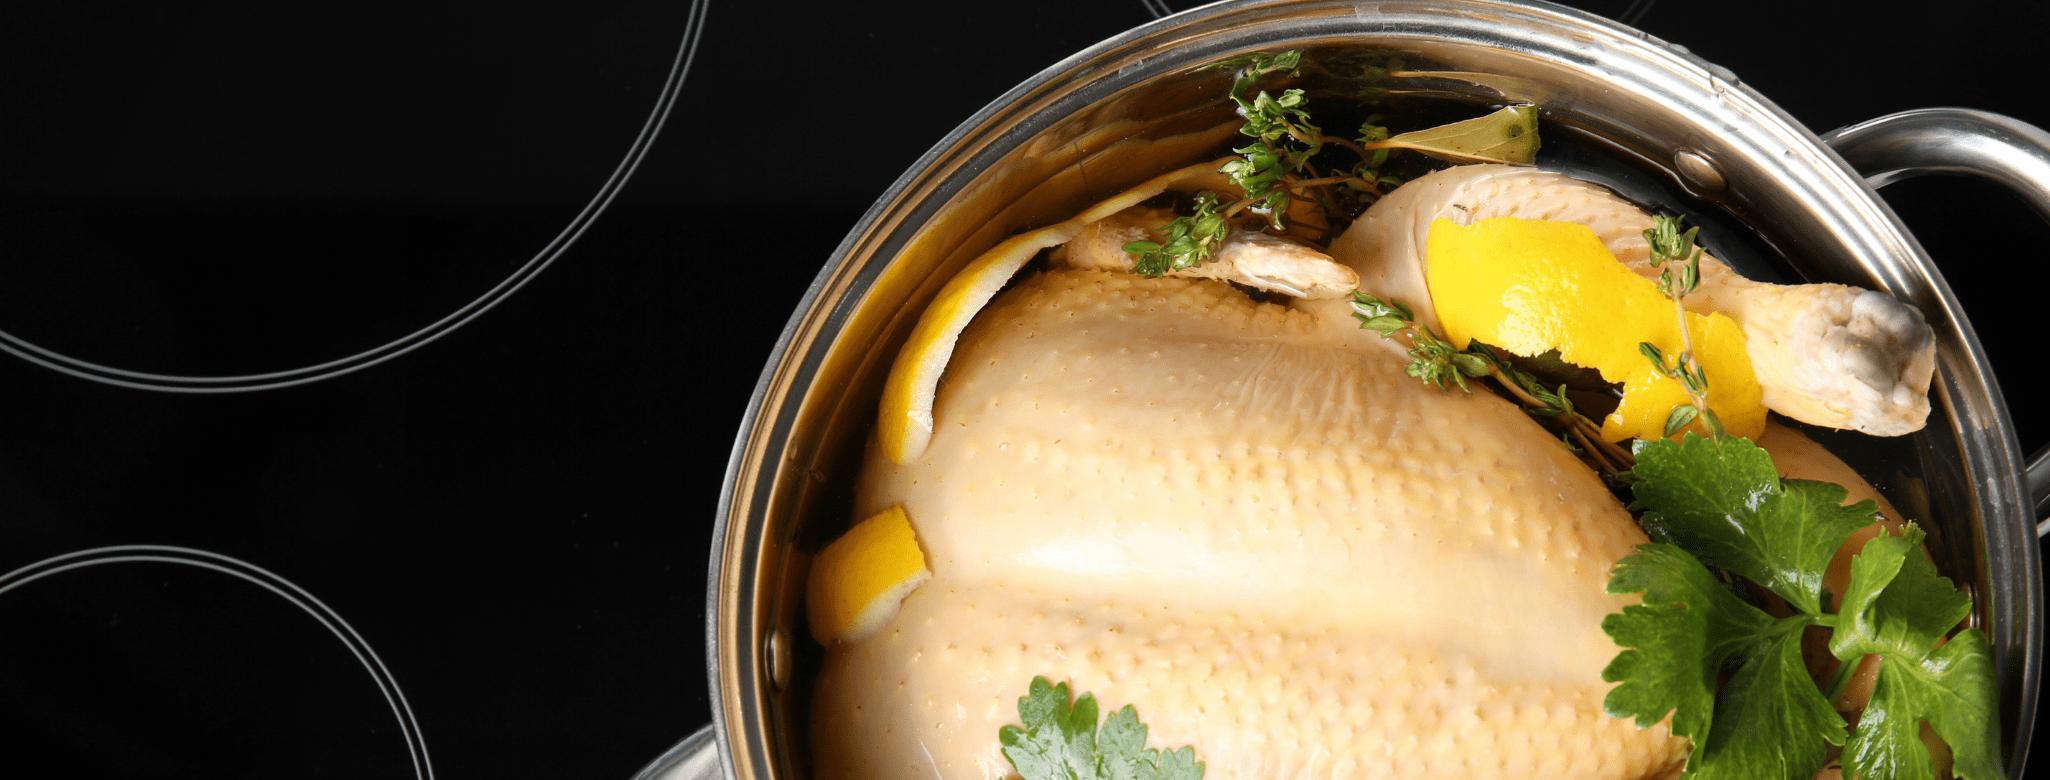 The Butcher's Wife's Brine Recipe